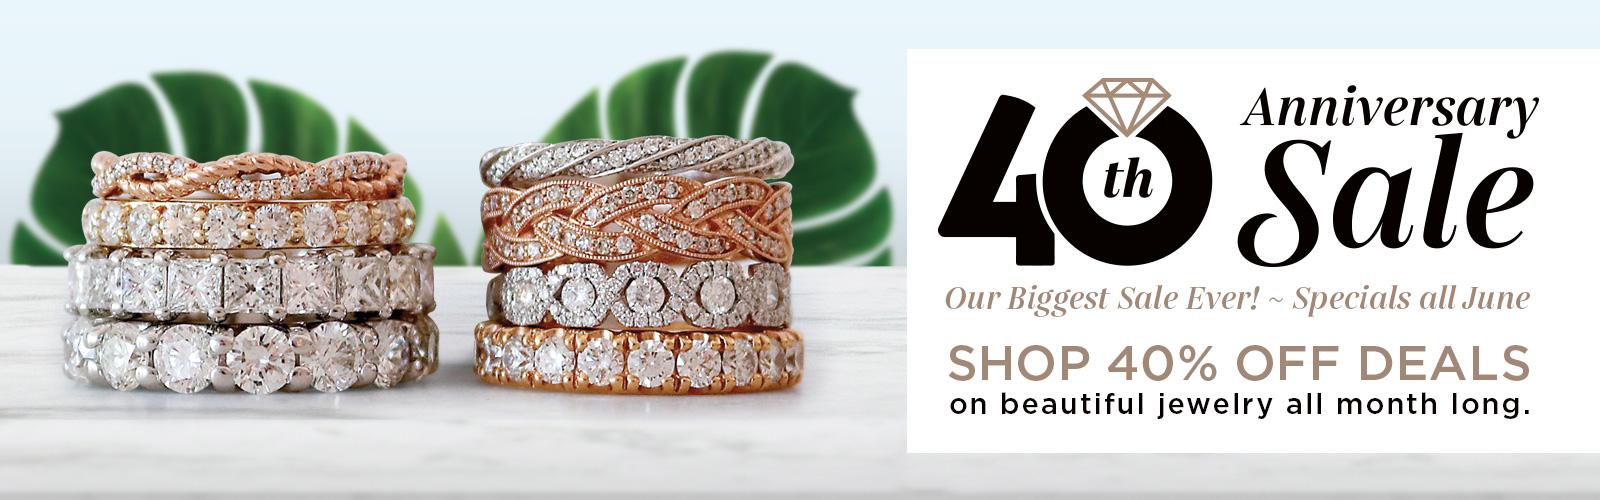 Bentley Diamond 40th Anniversary Sale!